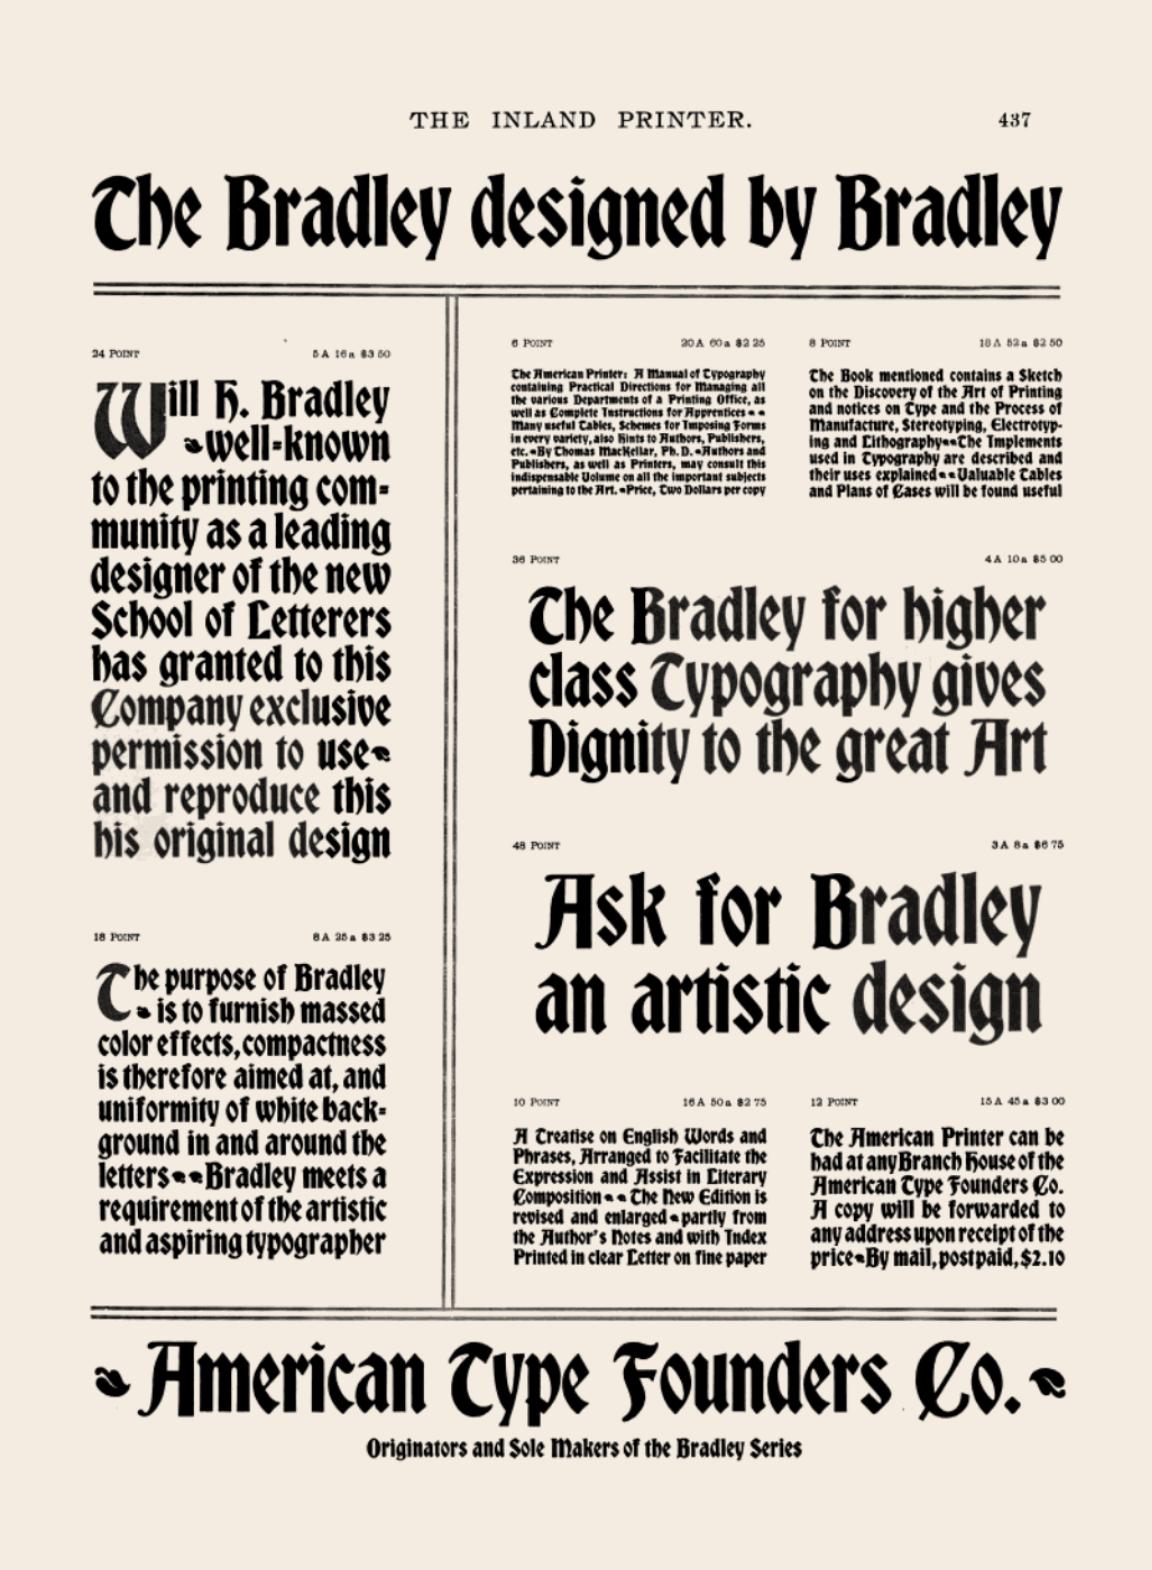 1895 October Inland Printer ATF Bradley Series ad